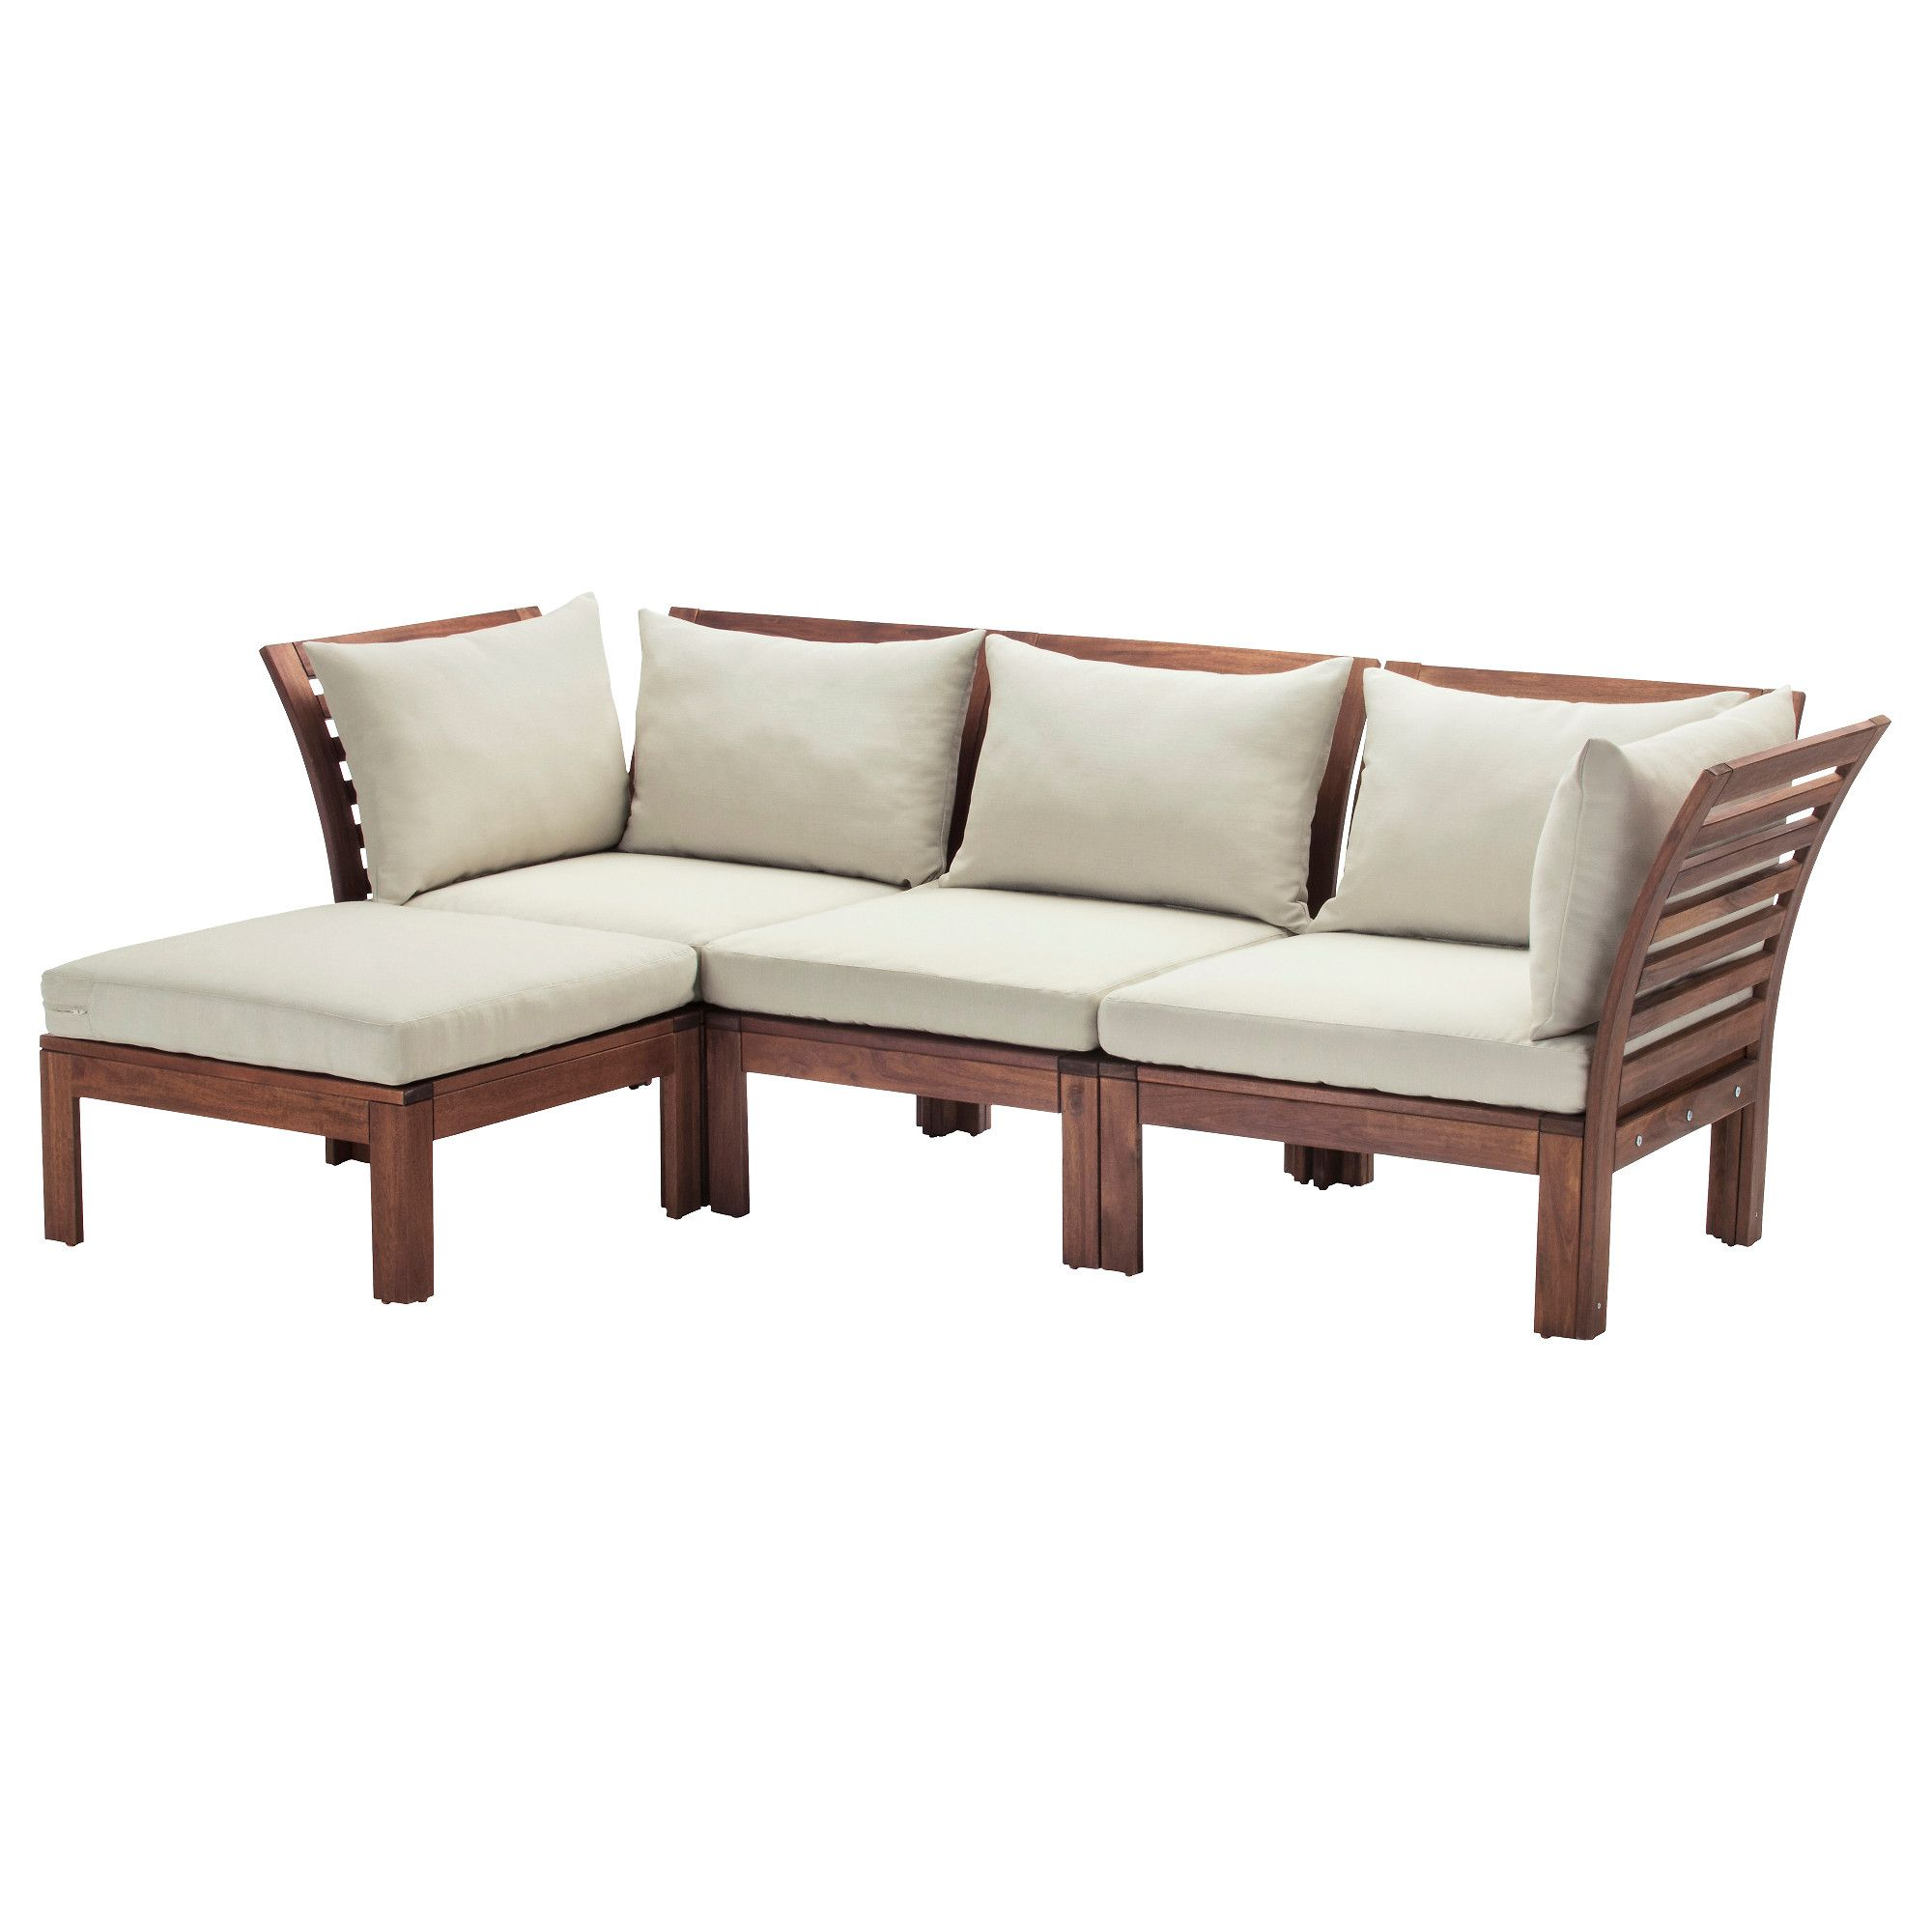 Us Furniture And Home Furnishings Ikea Outdoor Outdoor Sofa Ikea Garden Furniture